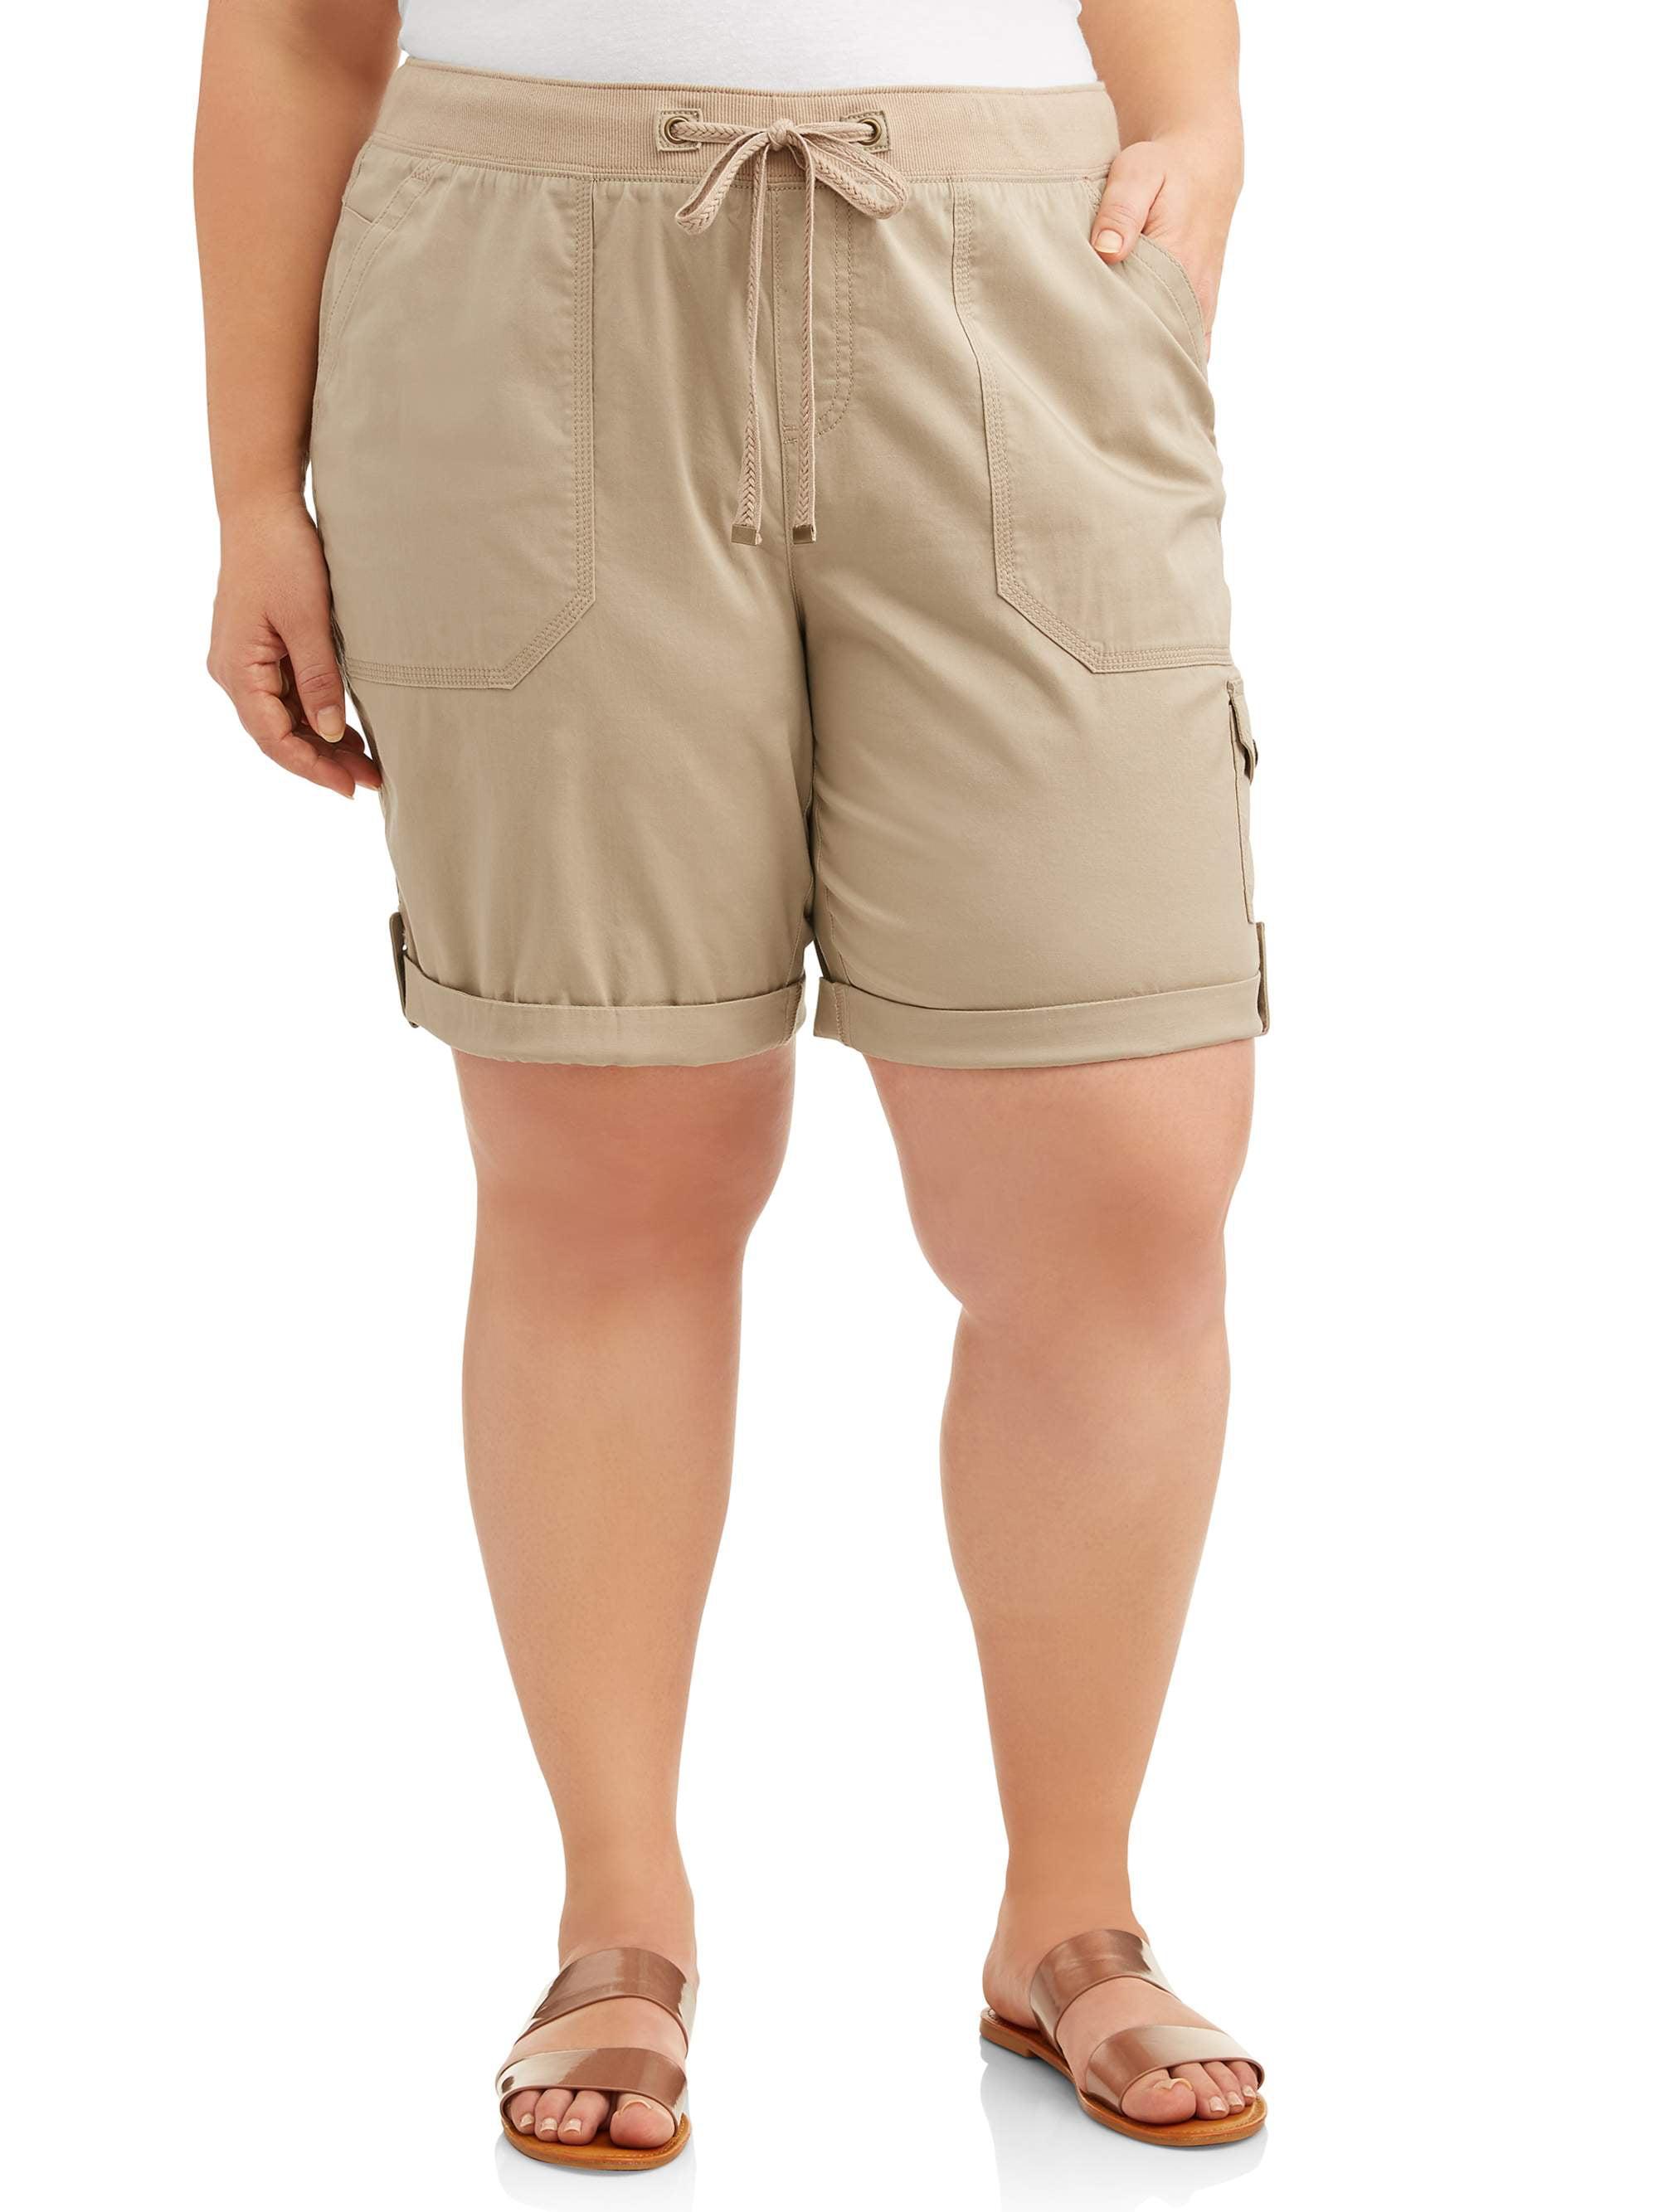 Women's Plus Size Cargo Shorts